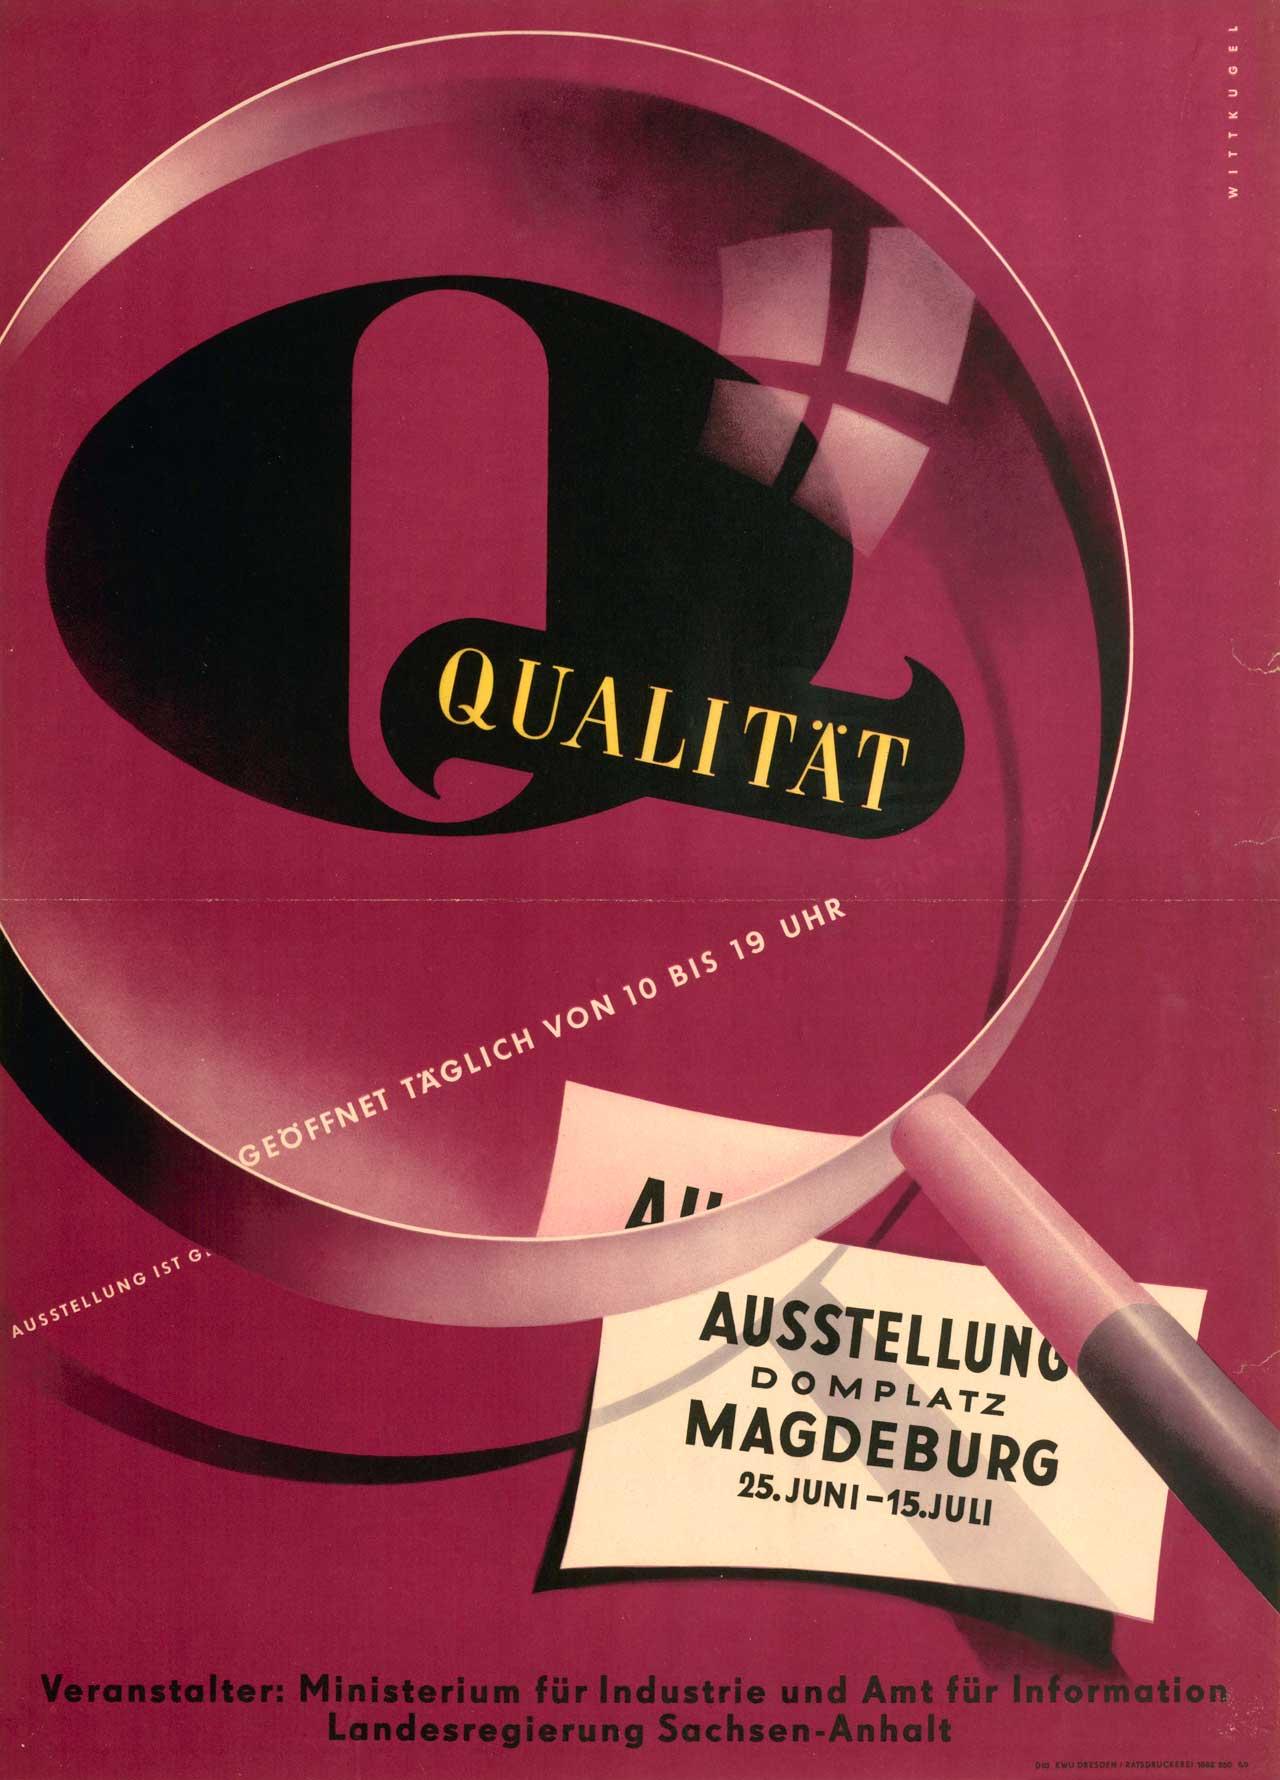 aiga-design-Wittkugel-1950-Qualitaet-02 (1).jpg